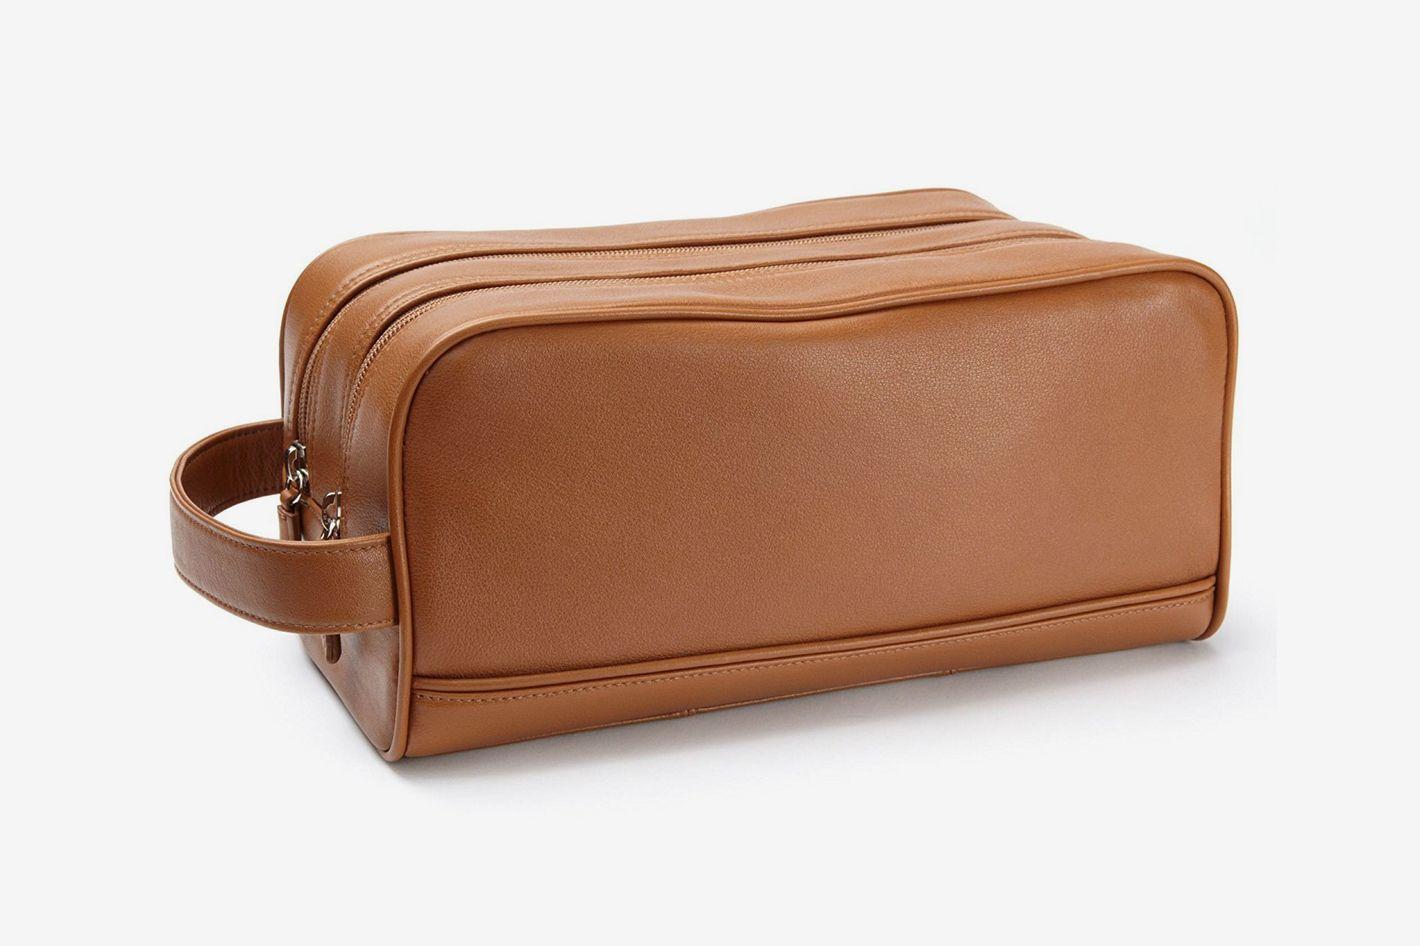 Leatherology Double Zip Toiletry Bag — Cognac